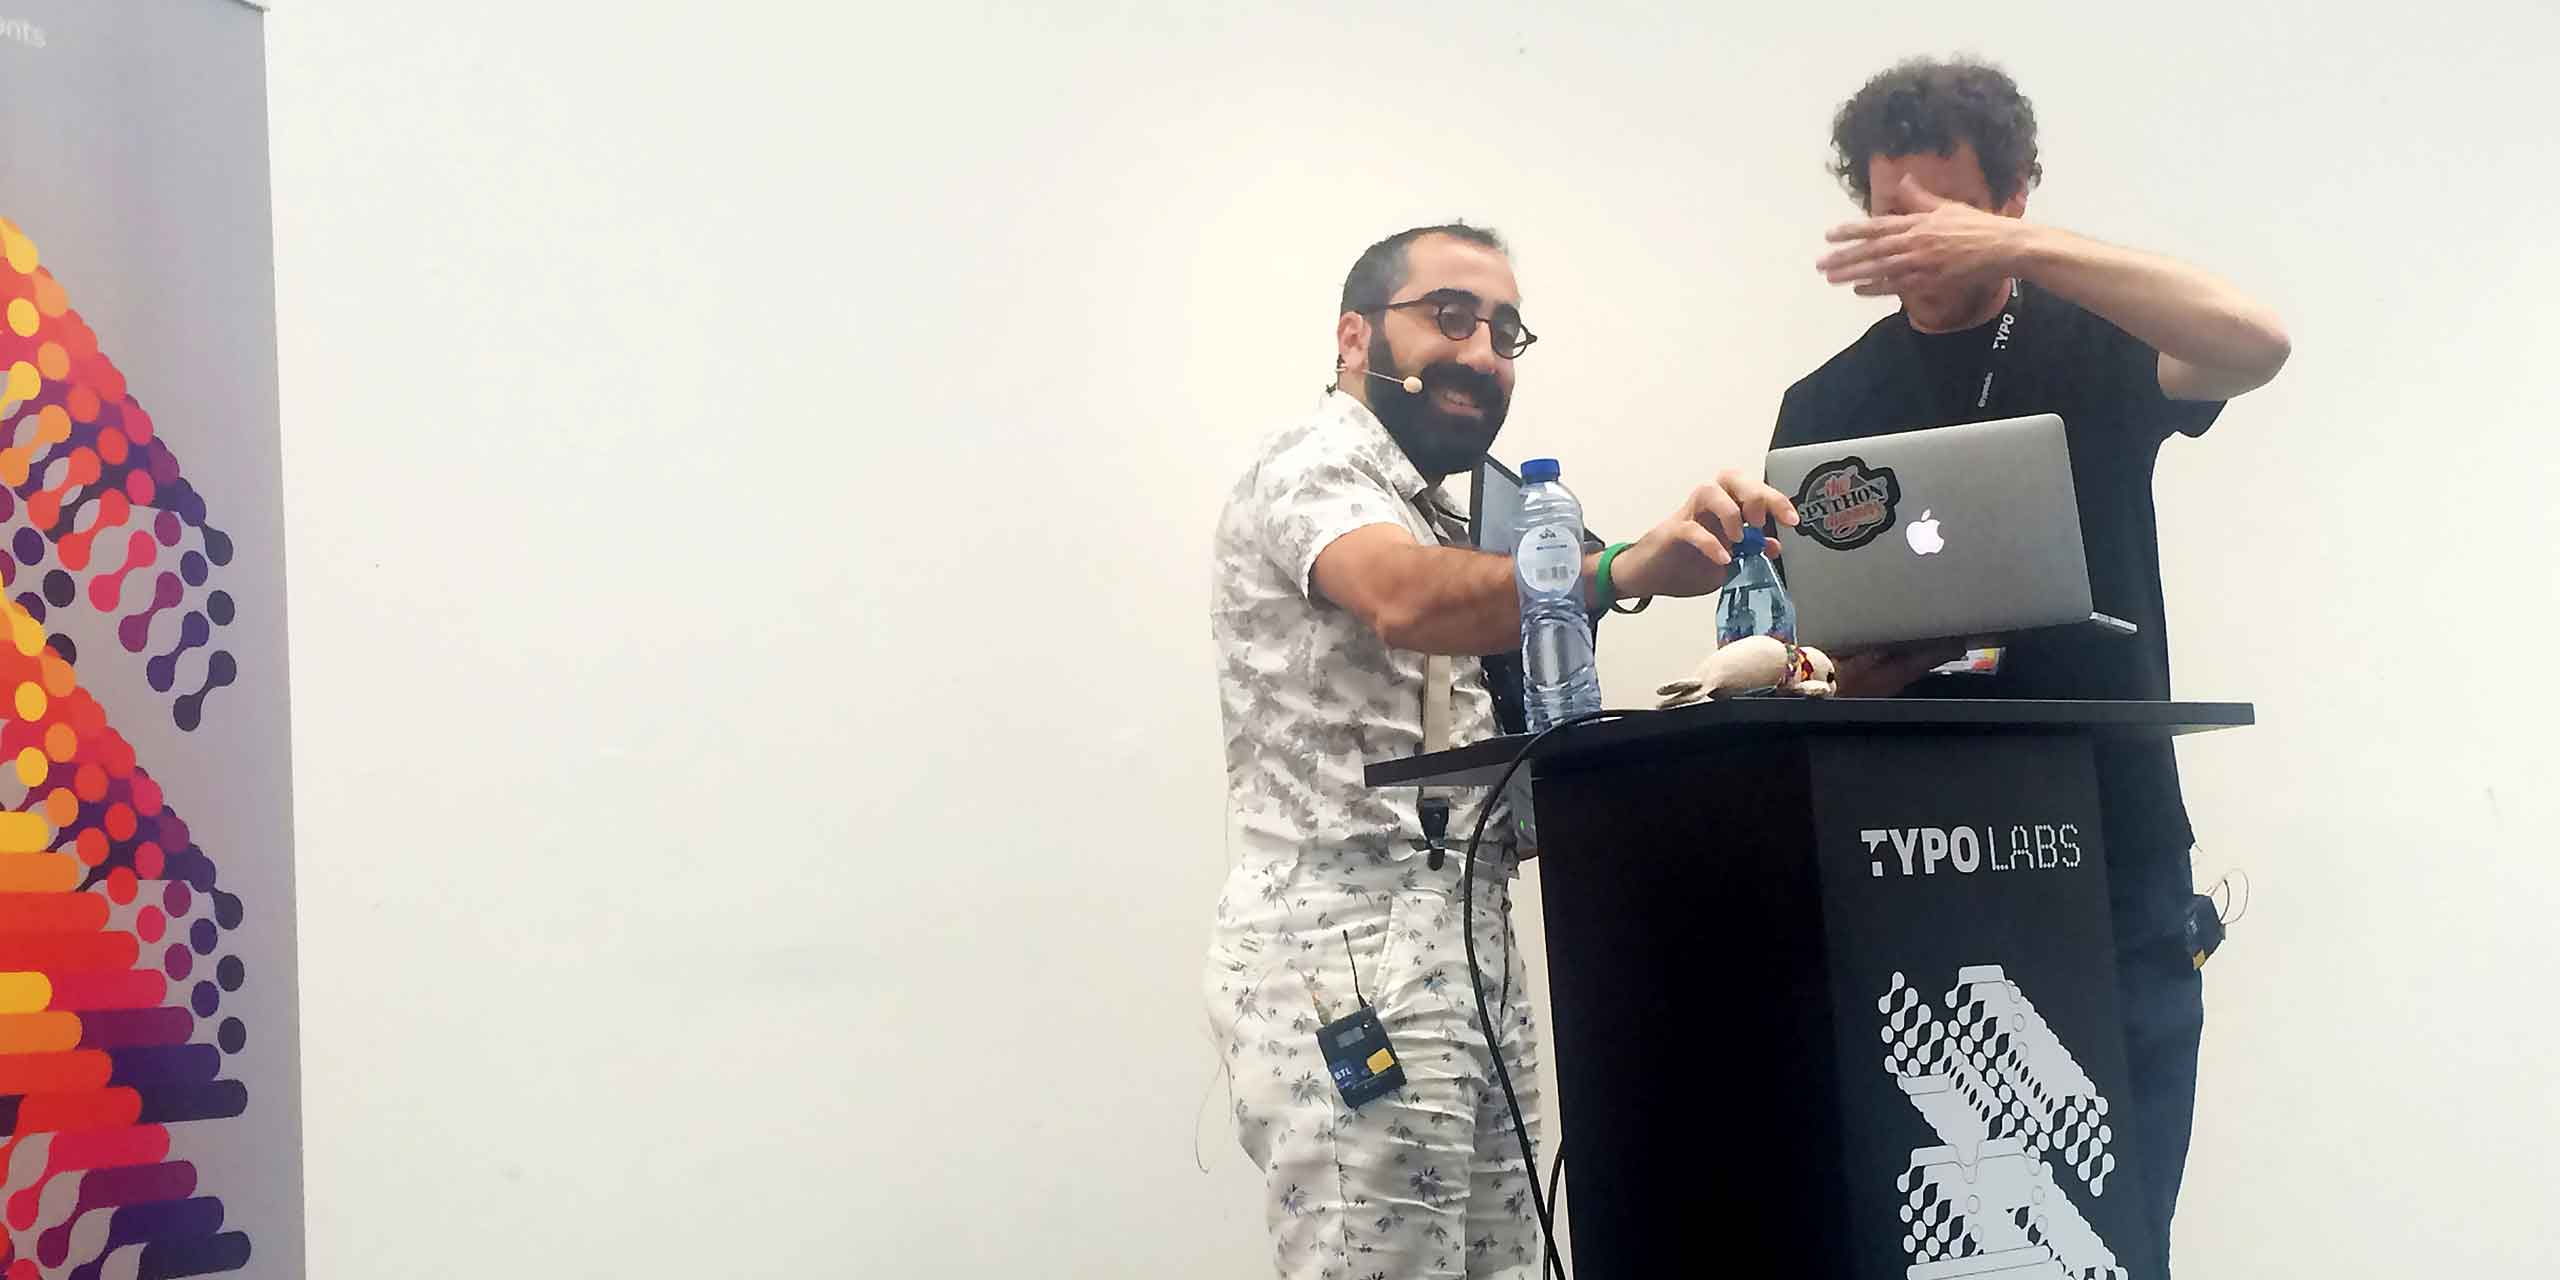 Bedhad Esfahbod & Just van Rossum talk